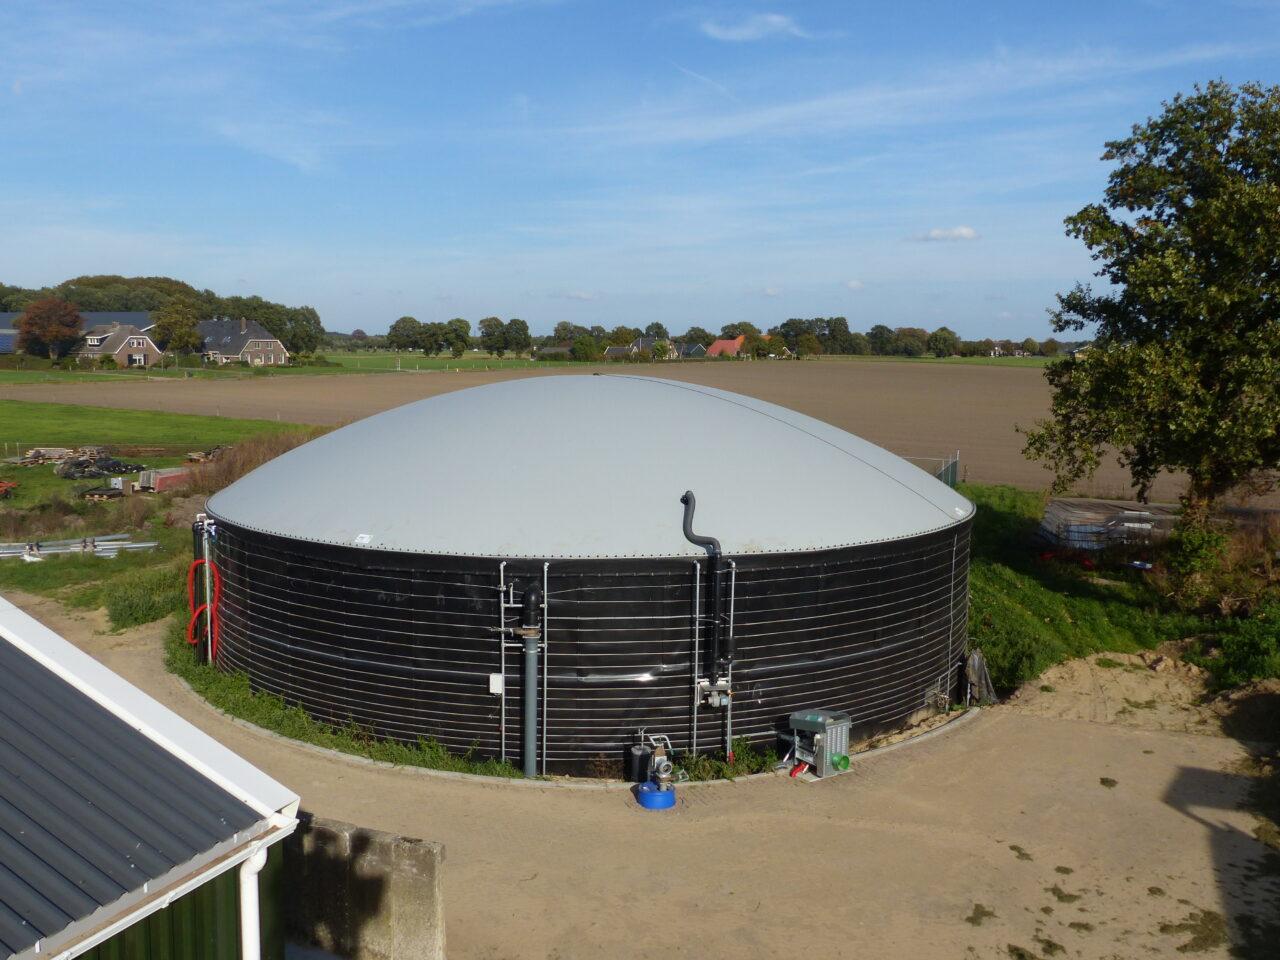 Manure fermentation on farm scale in Bathmen